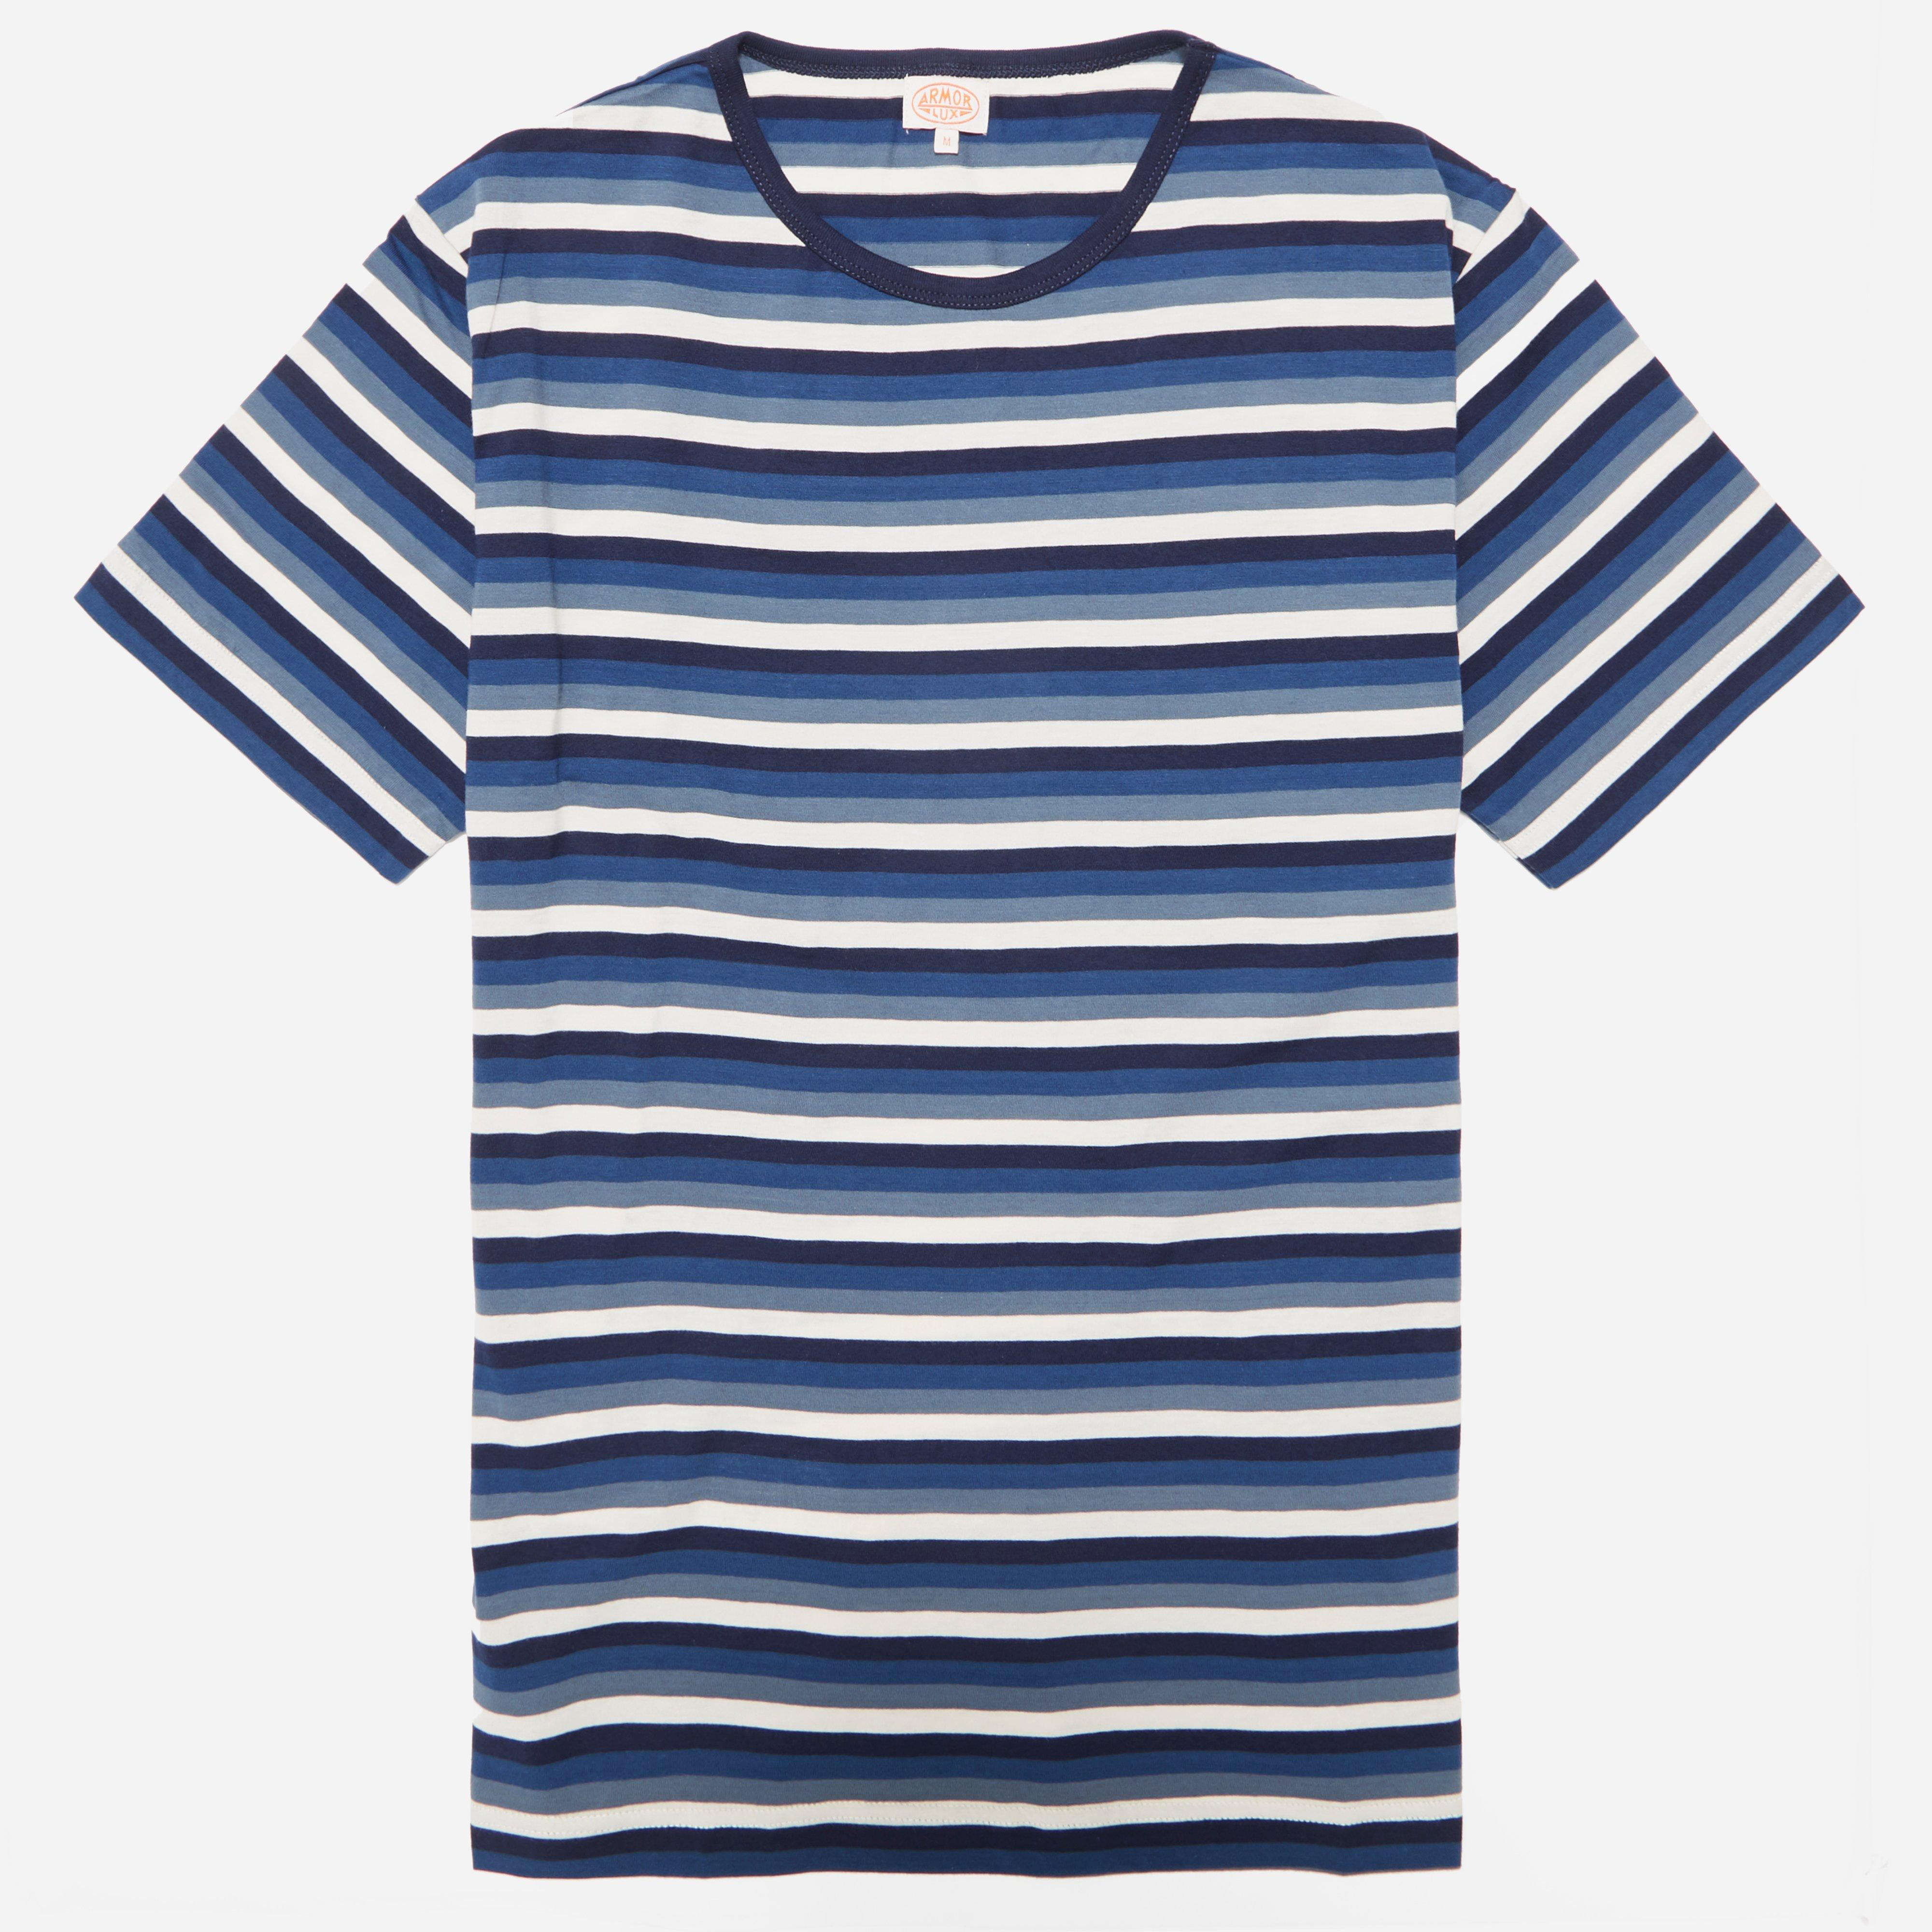 Armor Lux 75748 Stripe T-shirt